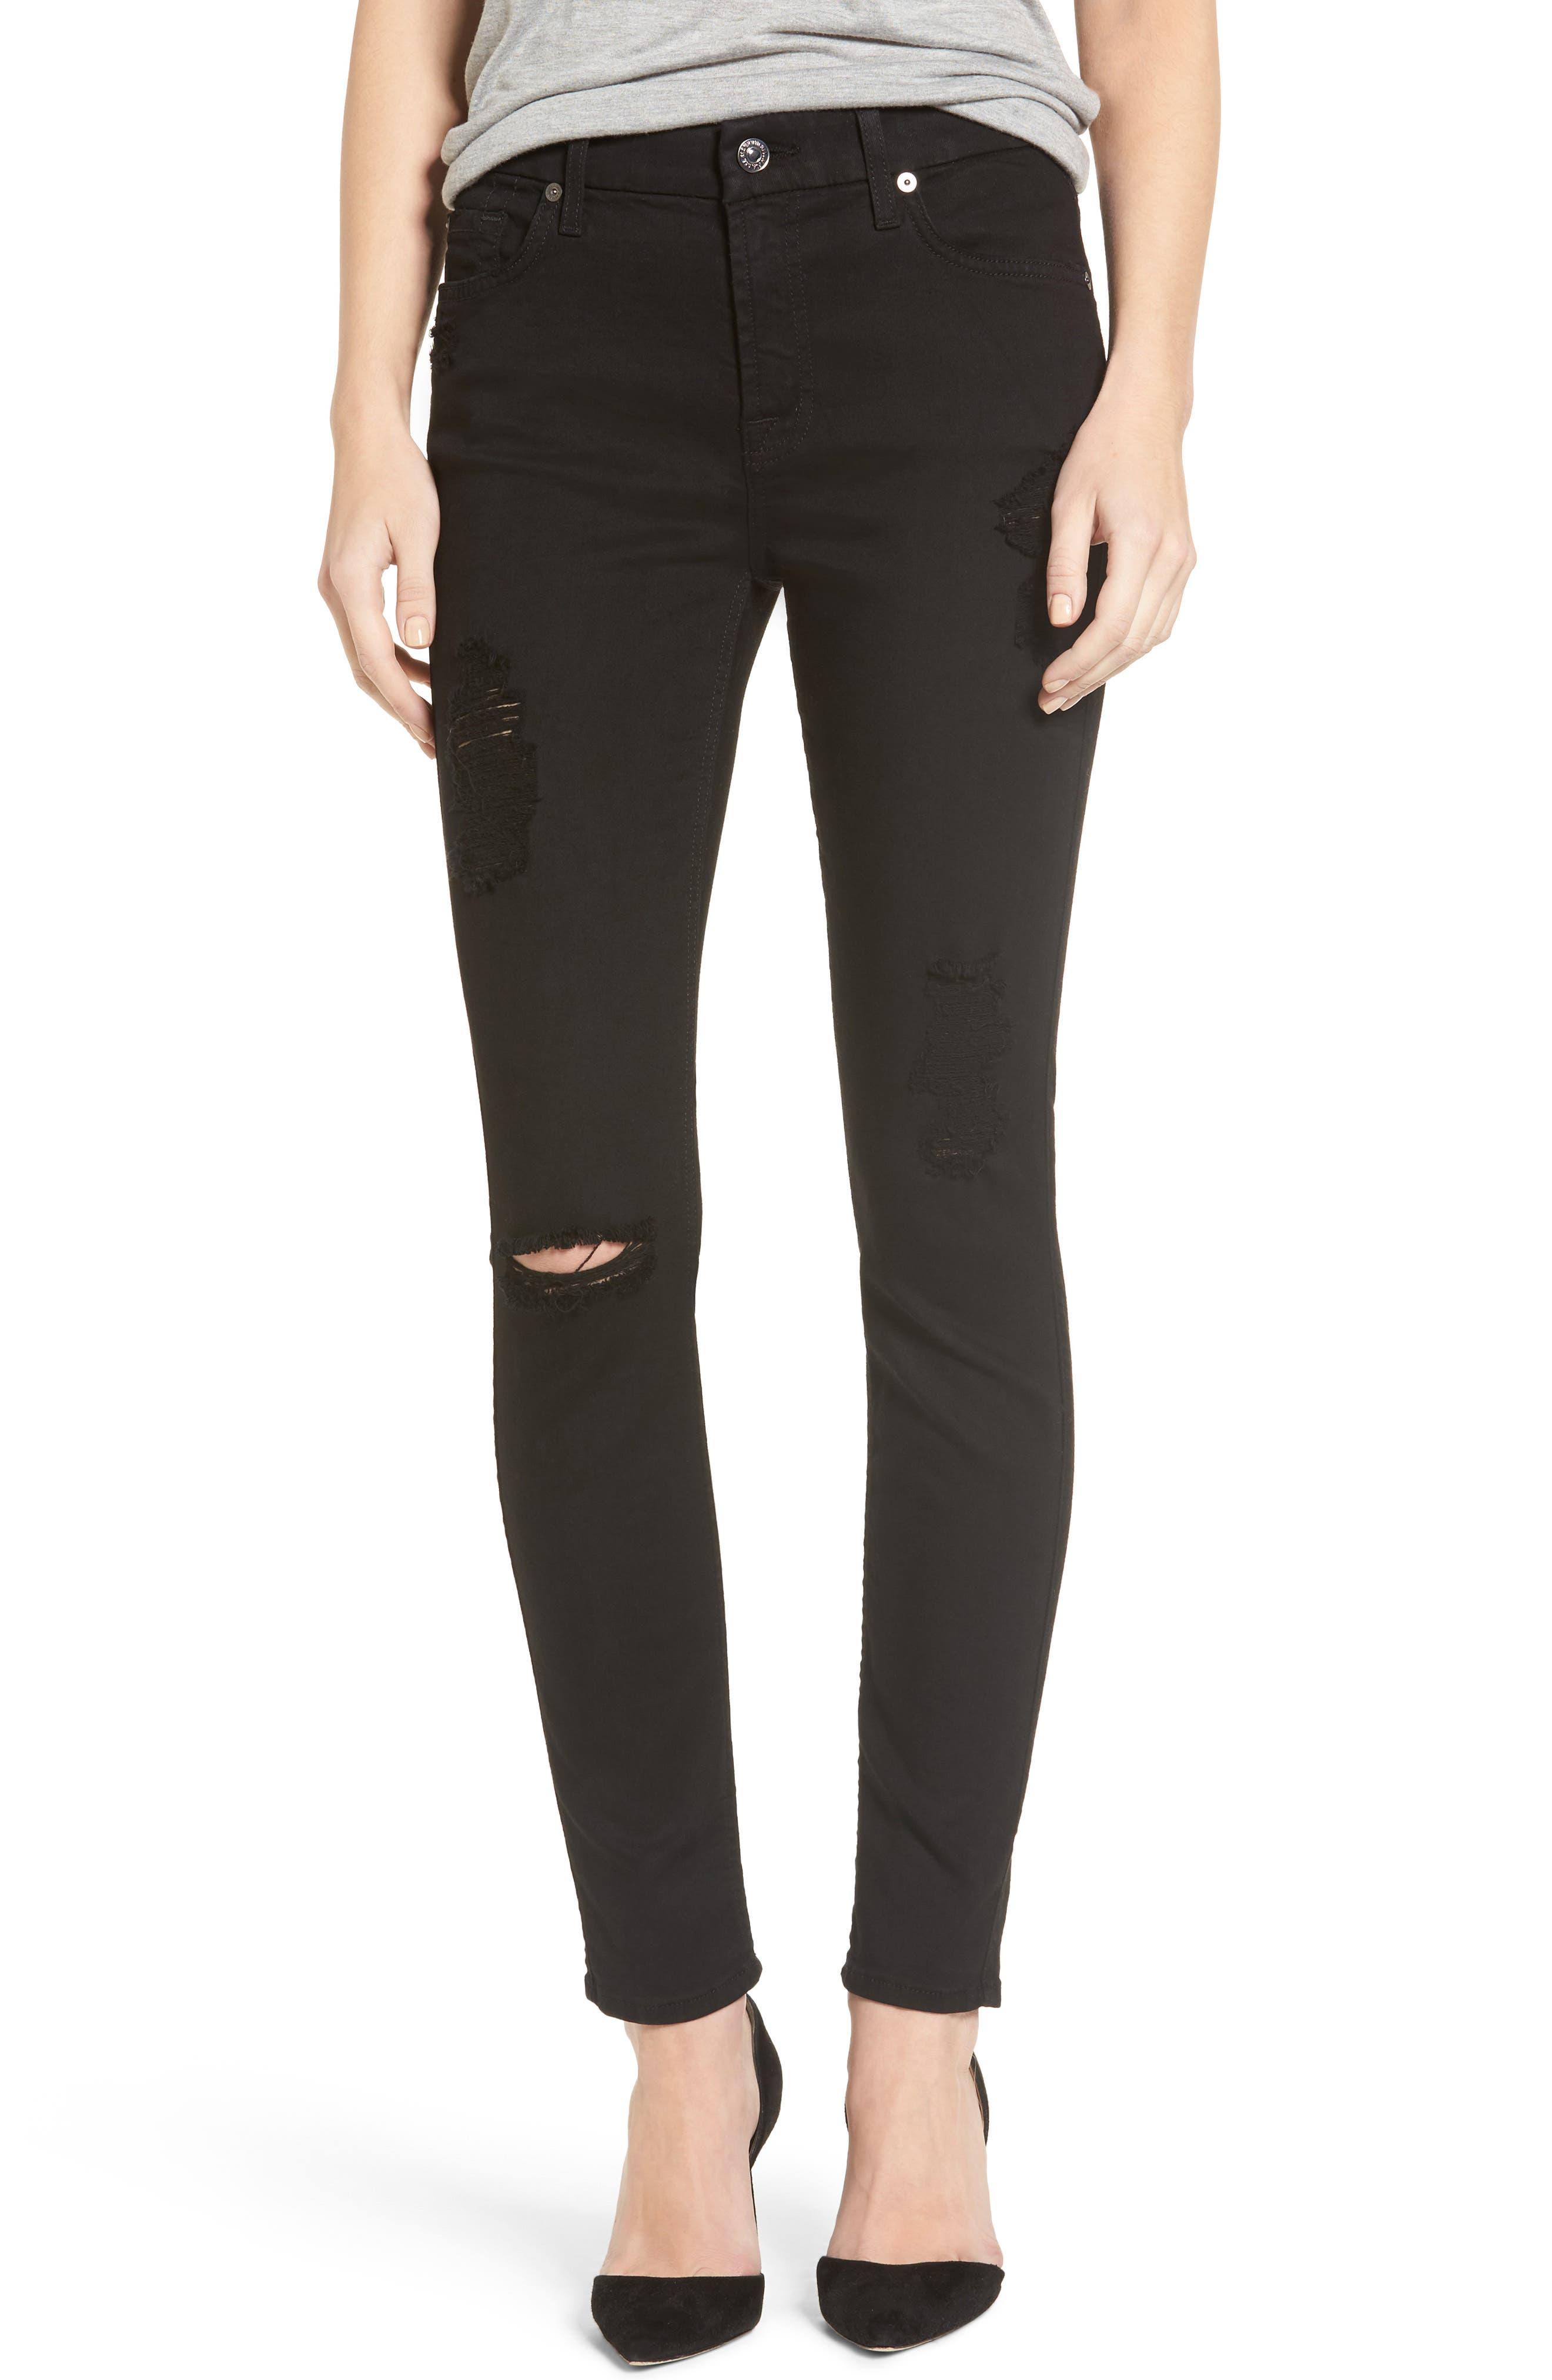 b(air) Ankle Skinny Jeans,                             Main thumbnail 1, color,                             BAIR BLACK 3